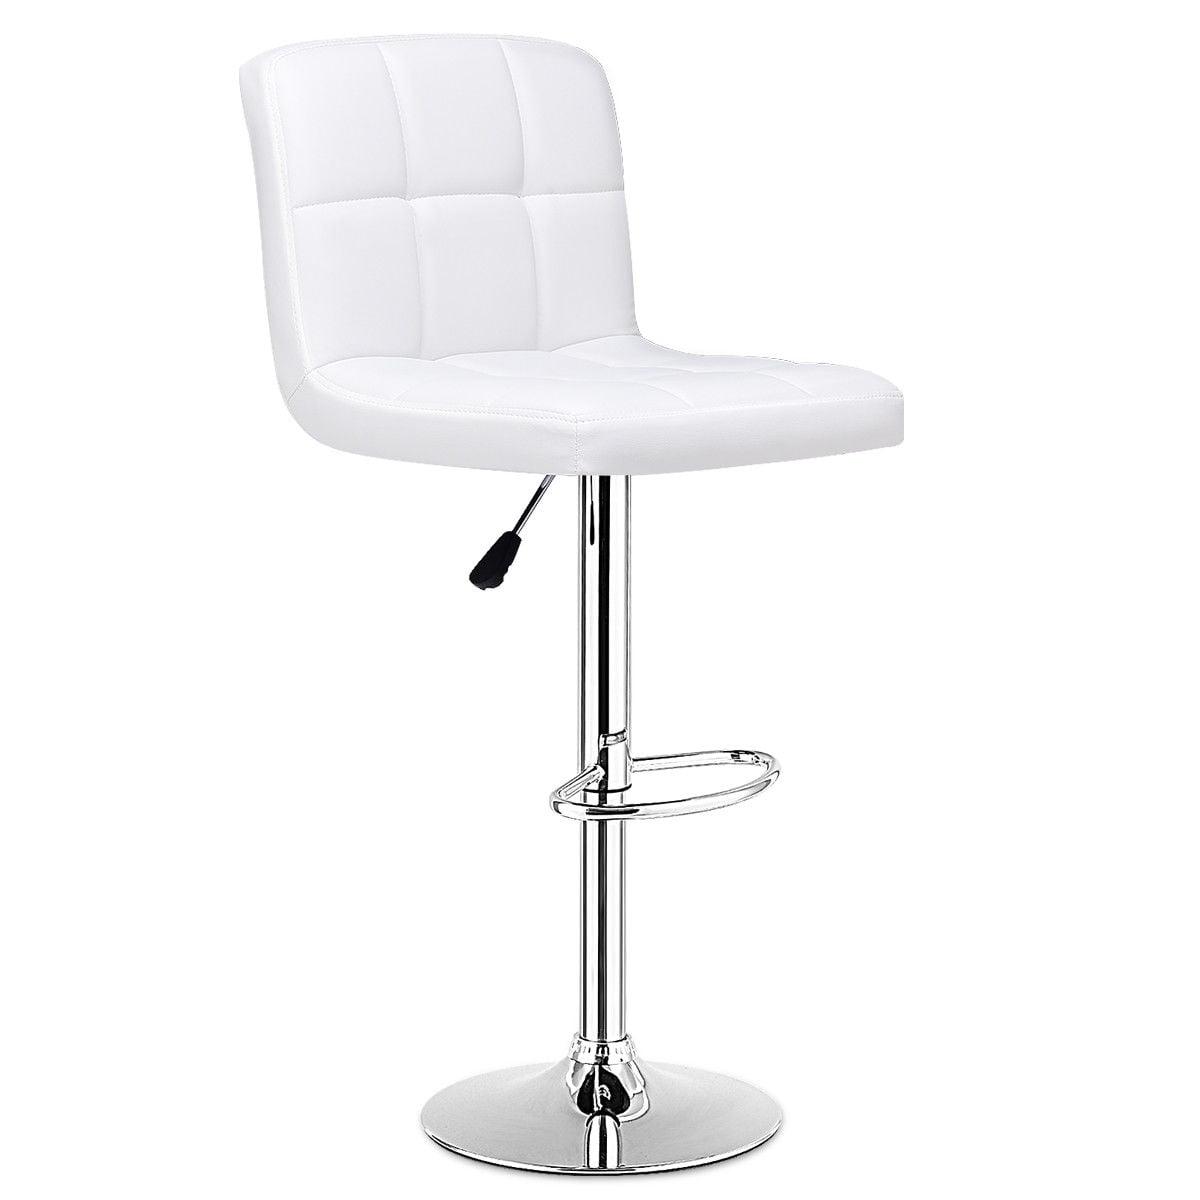 Set Of 2 Bar Stools PU Leather Adjustable Barstool Swivel Pub Chairs White - image 4 de 10